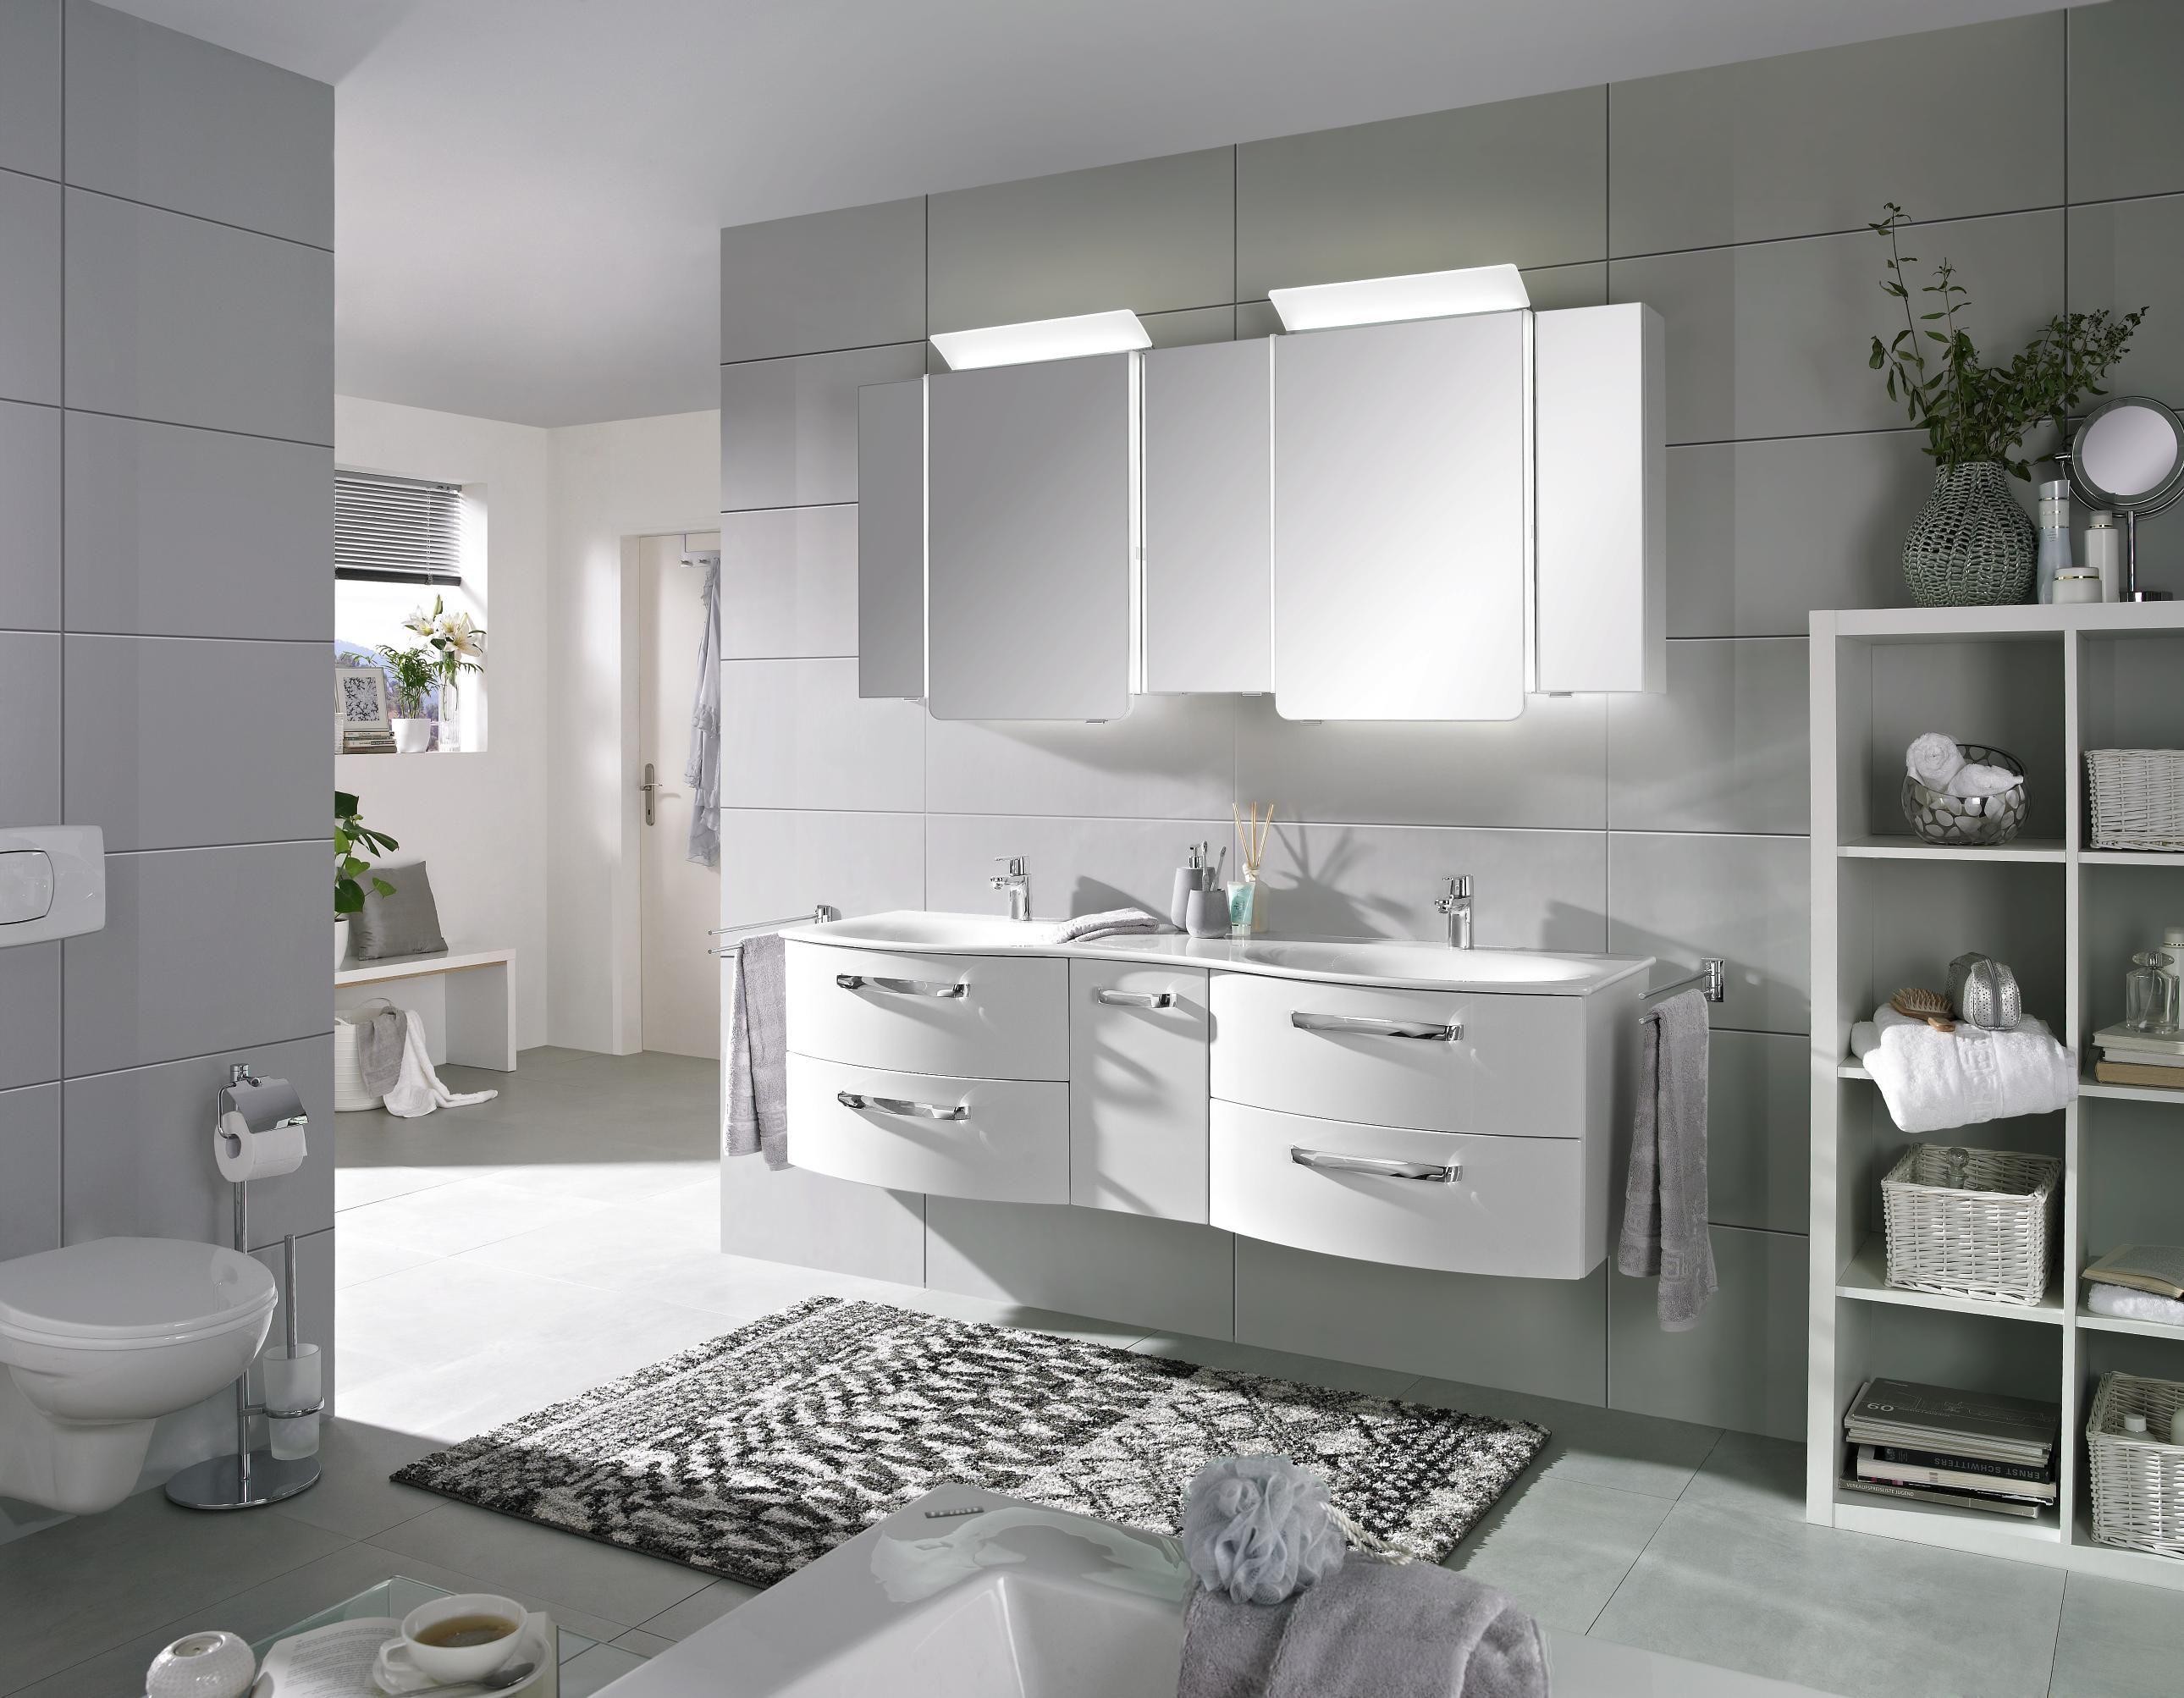 Deckenbeleuchtung Badezimmer ~ 150 best badezimmer images on pinterest